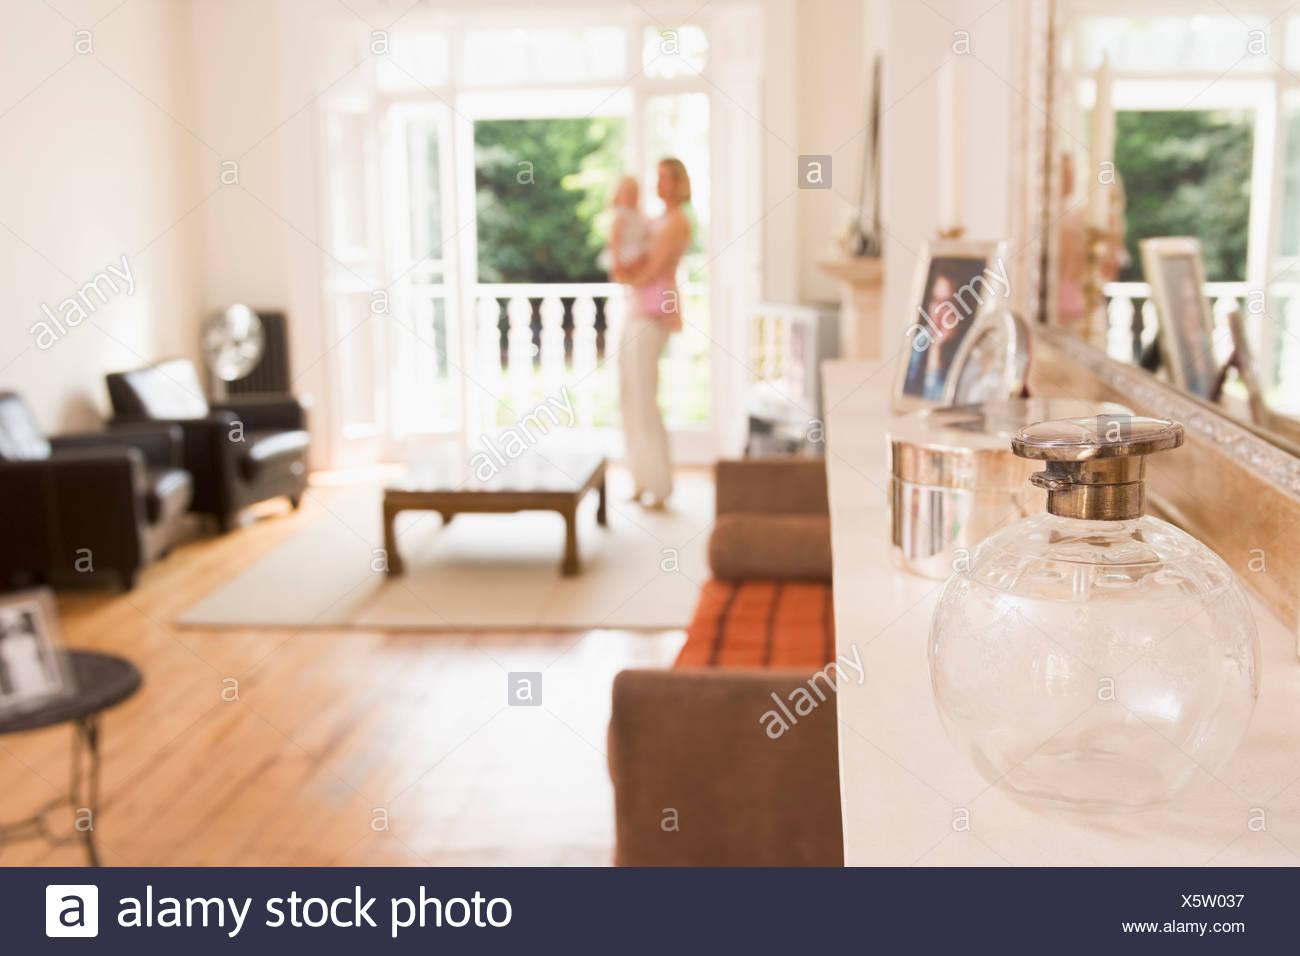 stylish nursery furniture. Woman Standing In Living Room Holding Baby - Stock Image Stylish Nursery Furniture M